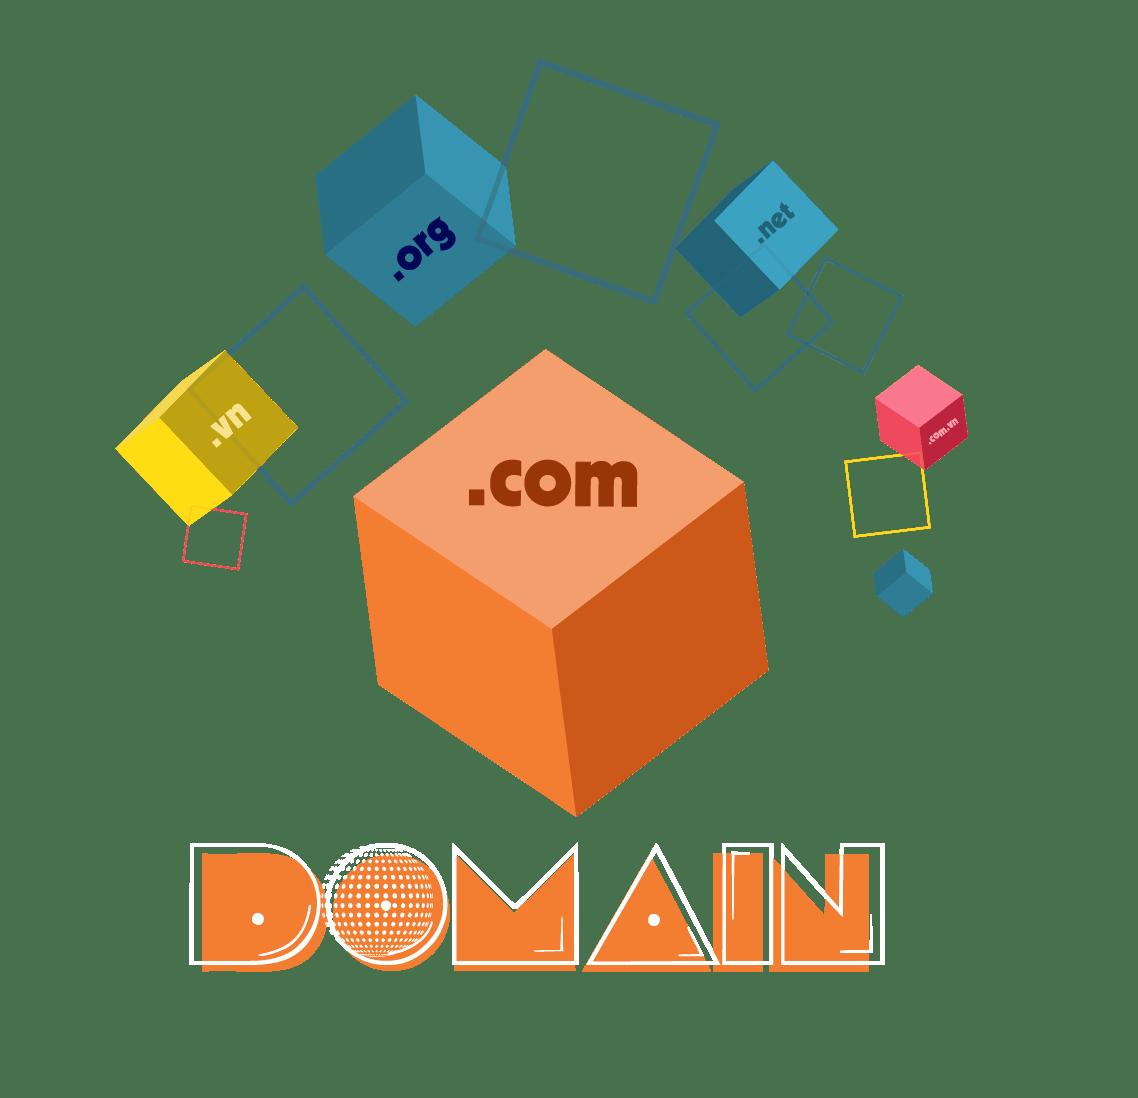 domain-yaviet